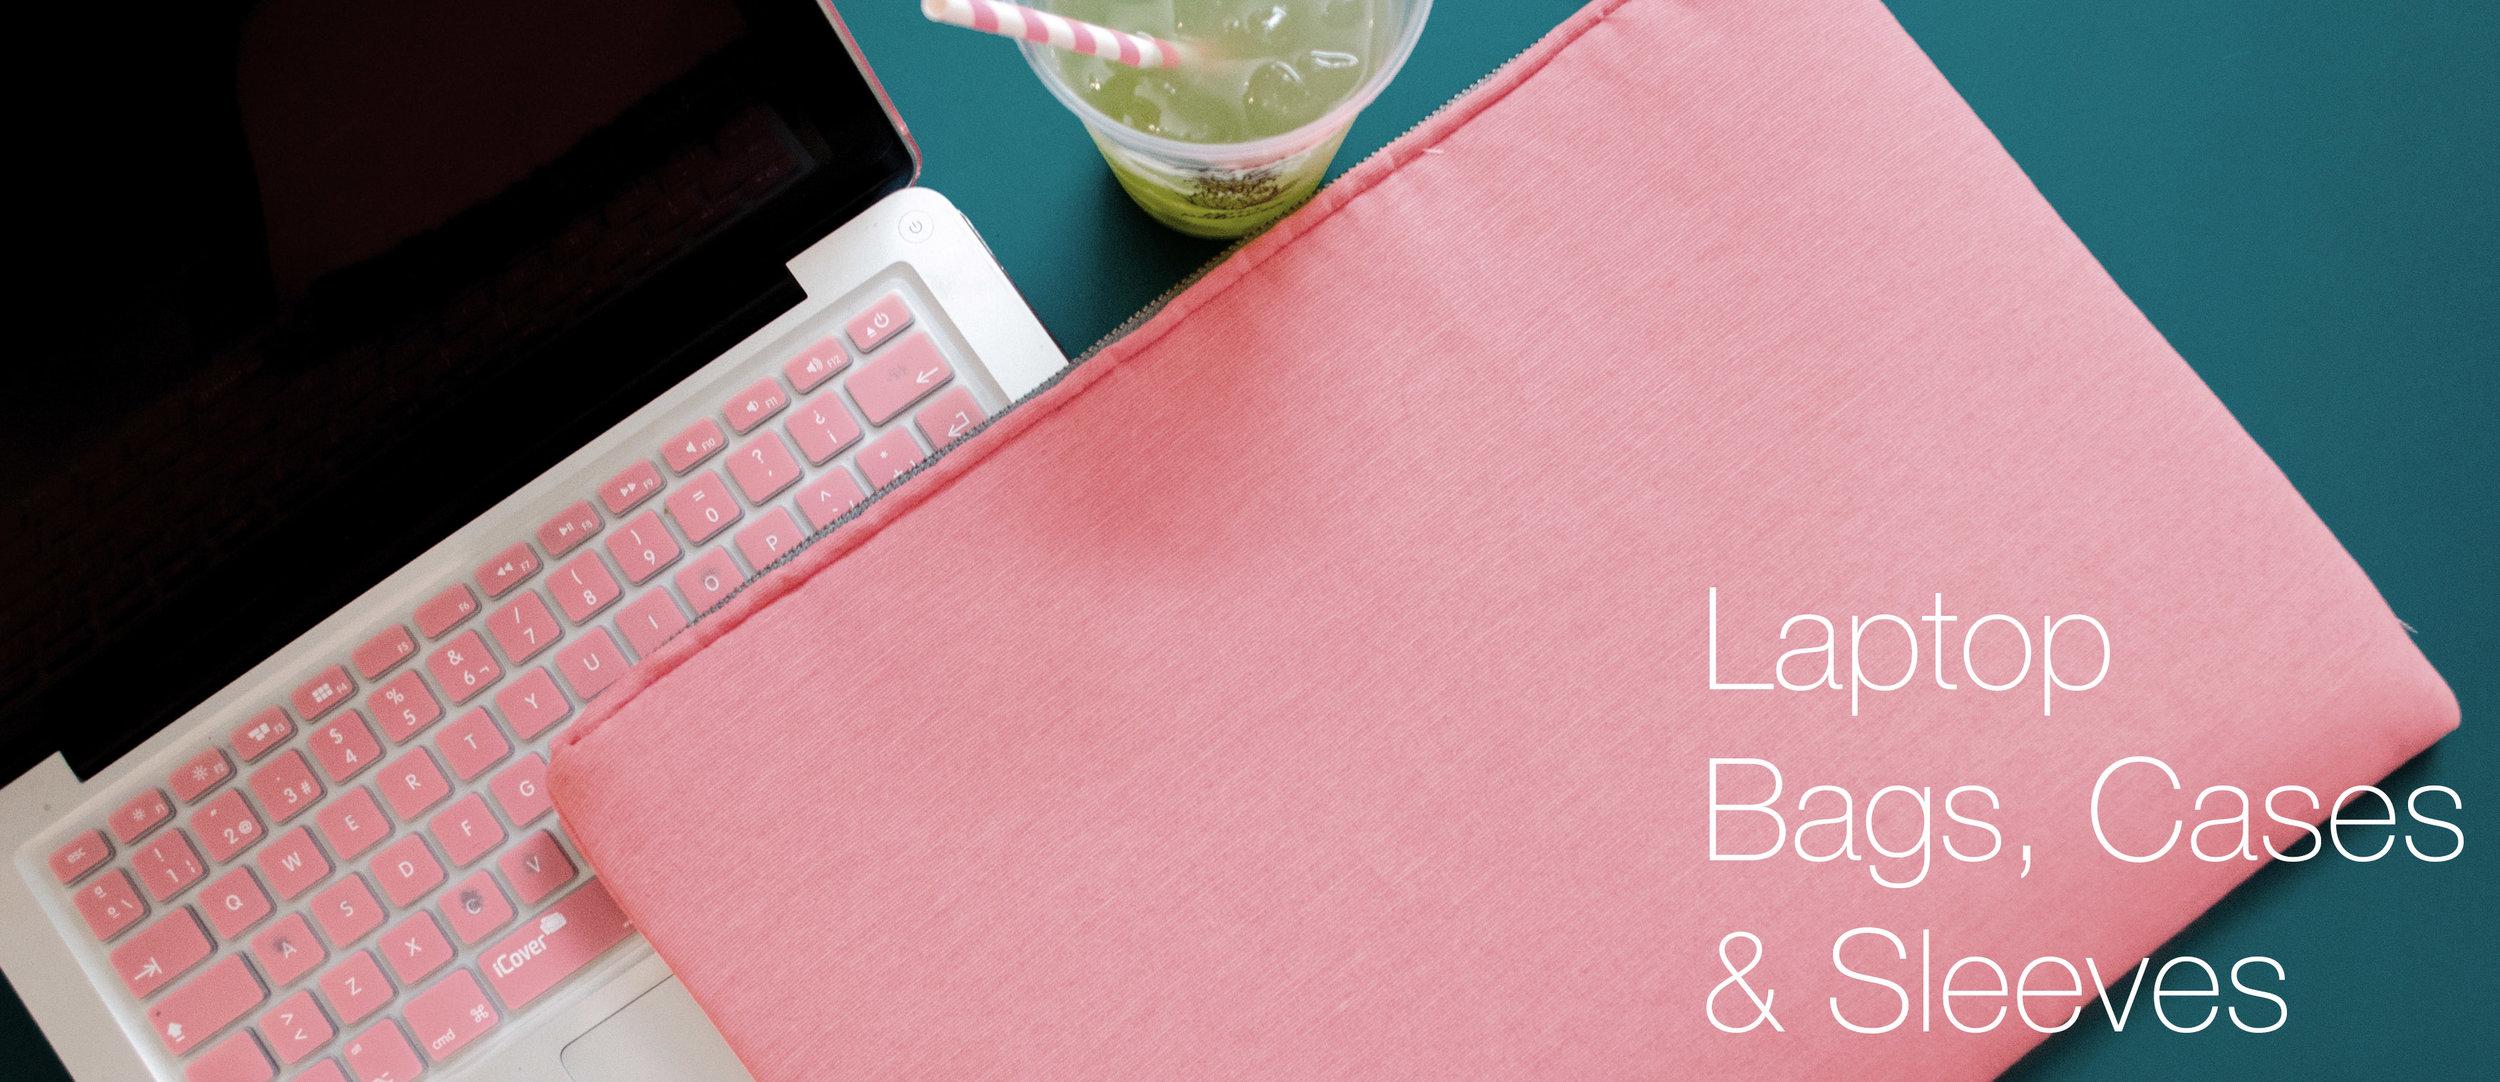 Best-Laptop-Cases-for-students.jpg